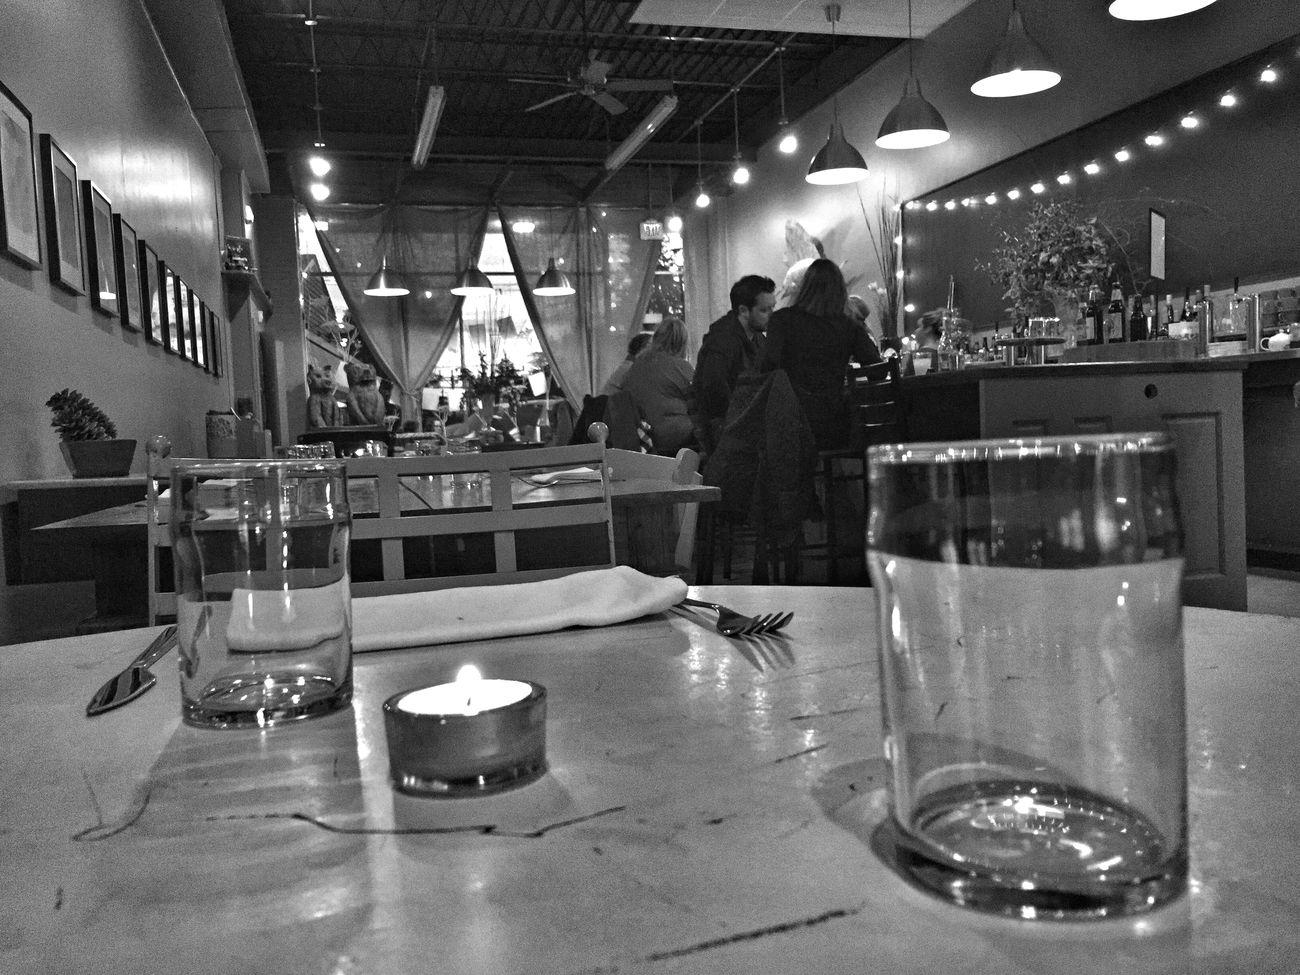 Streetphotography Monochrome Blackandwhite Black And White Happy Hour